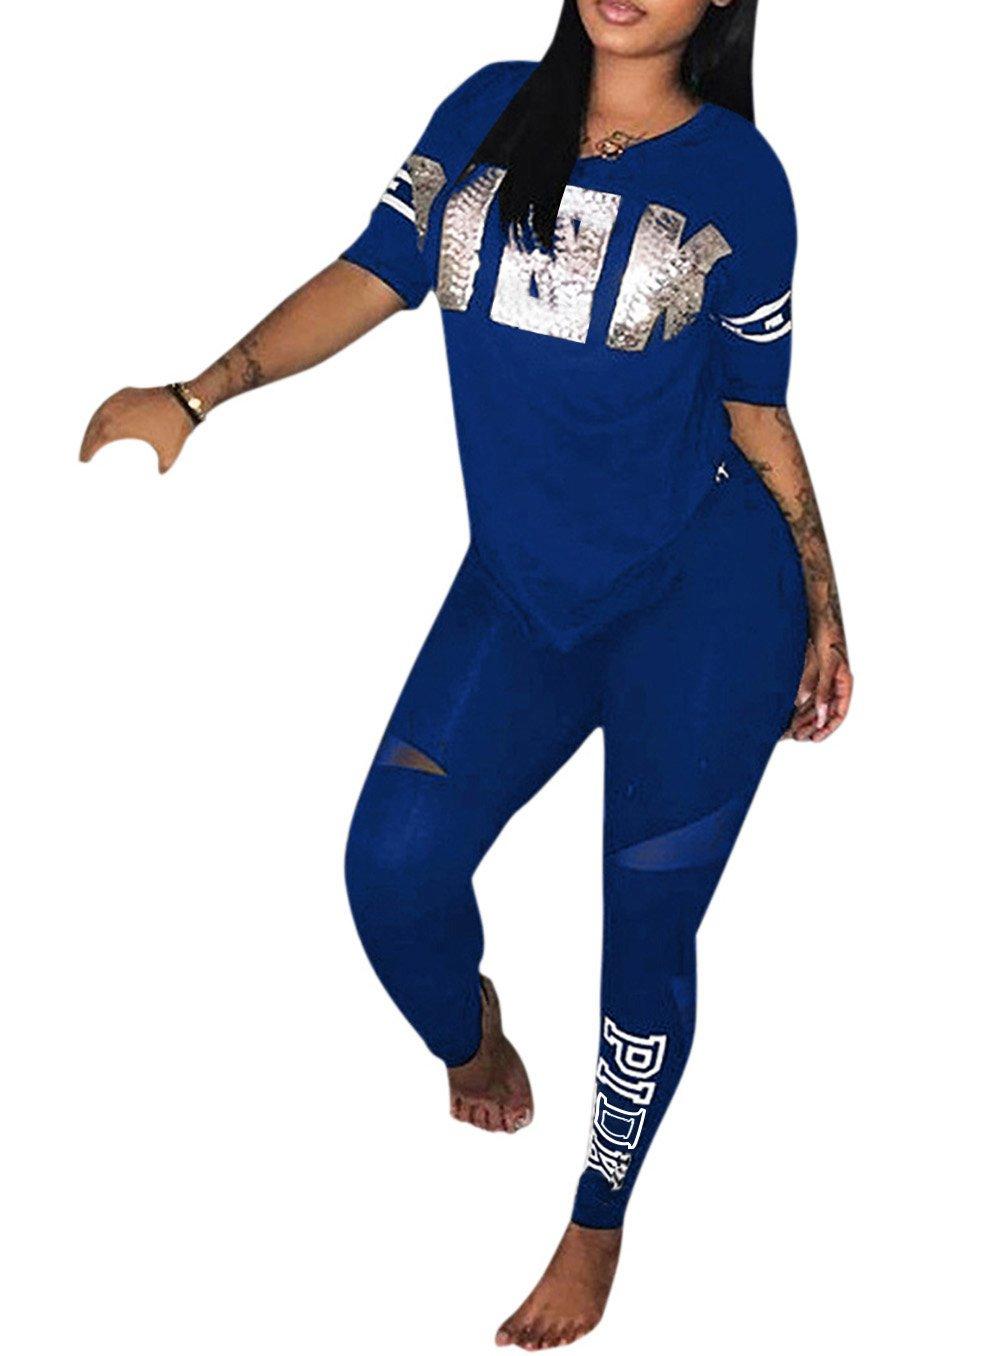 Molisry Women Word Letter Print V Neck Sweatshirt Long Pant Jumpsuits 2 Piece Outfits